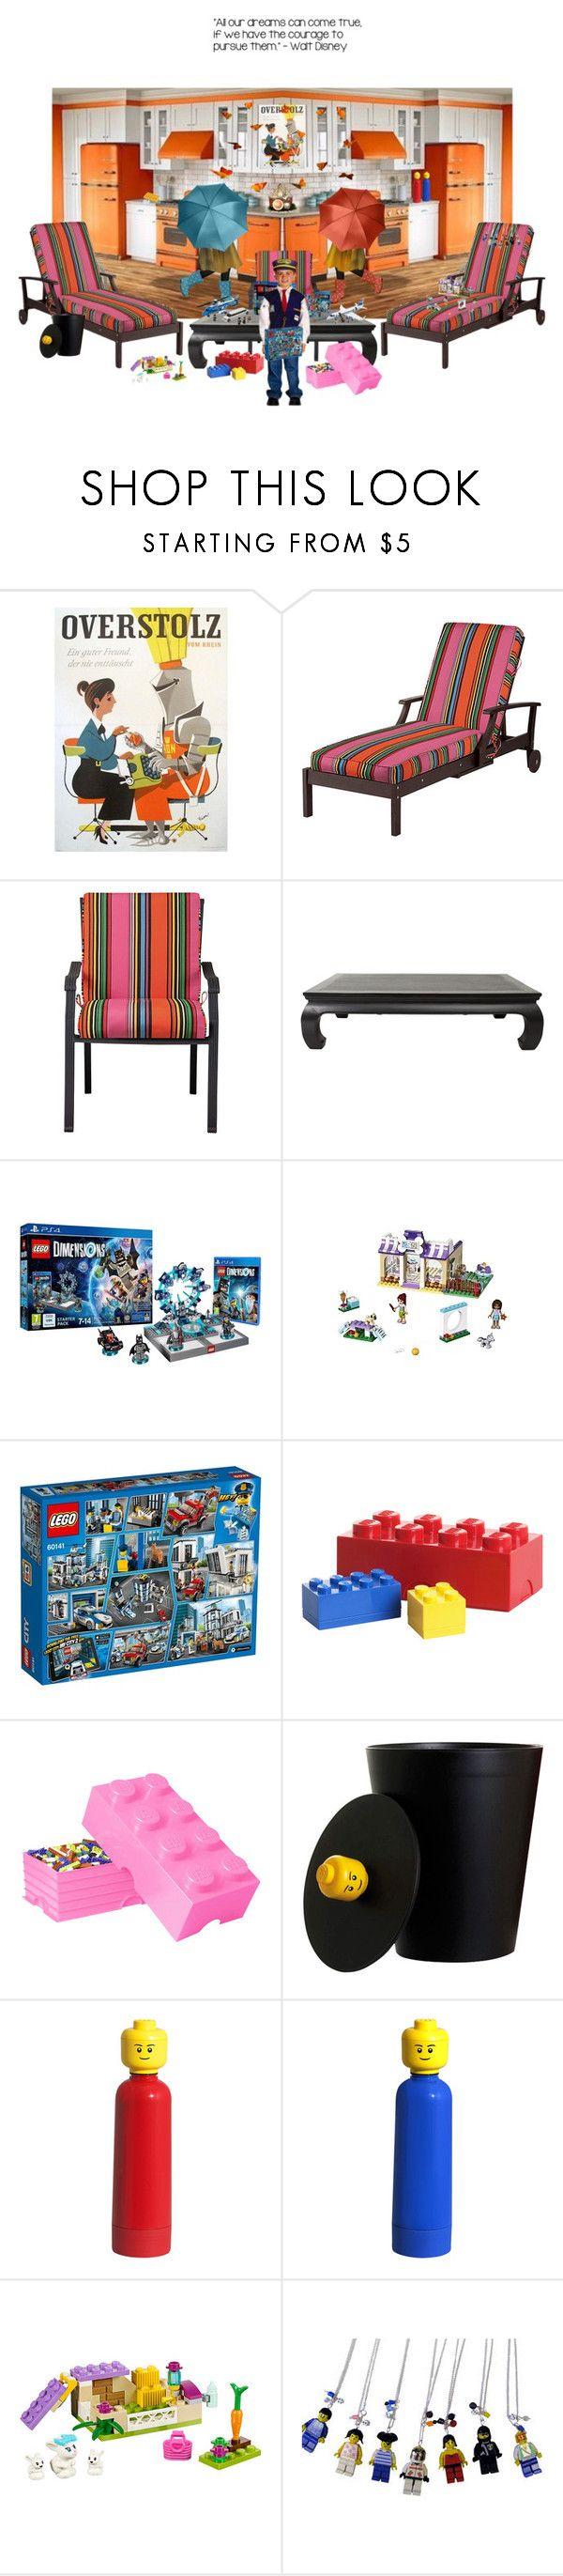 17 Best Ideas About Lego Room Decor On Pinterest Lego